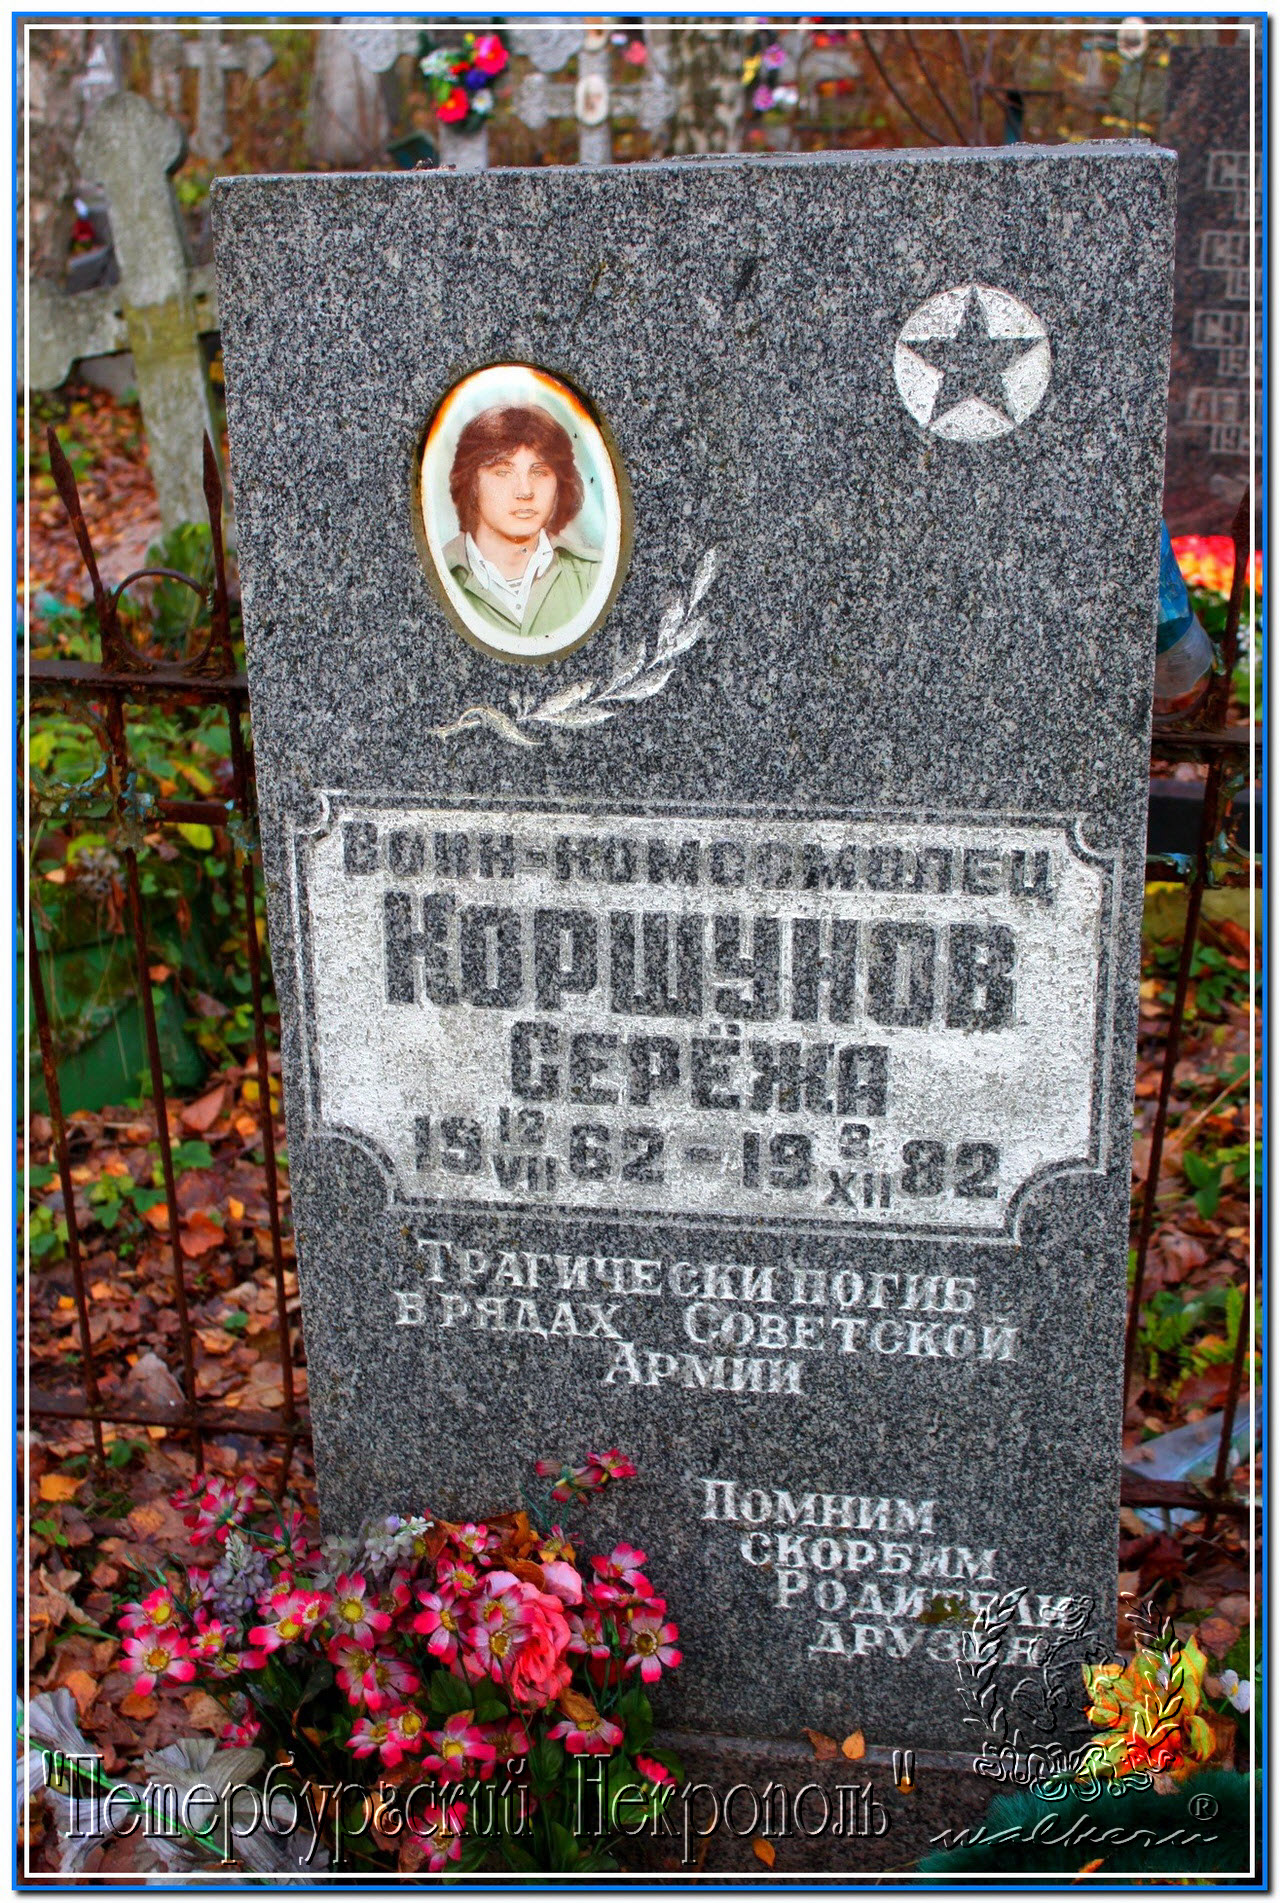 Коршунов Сергей